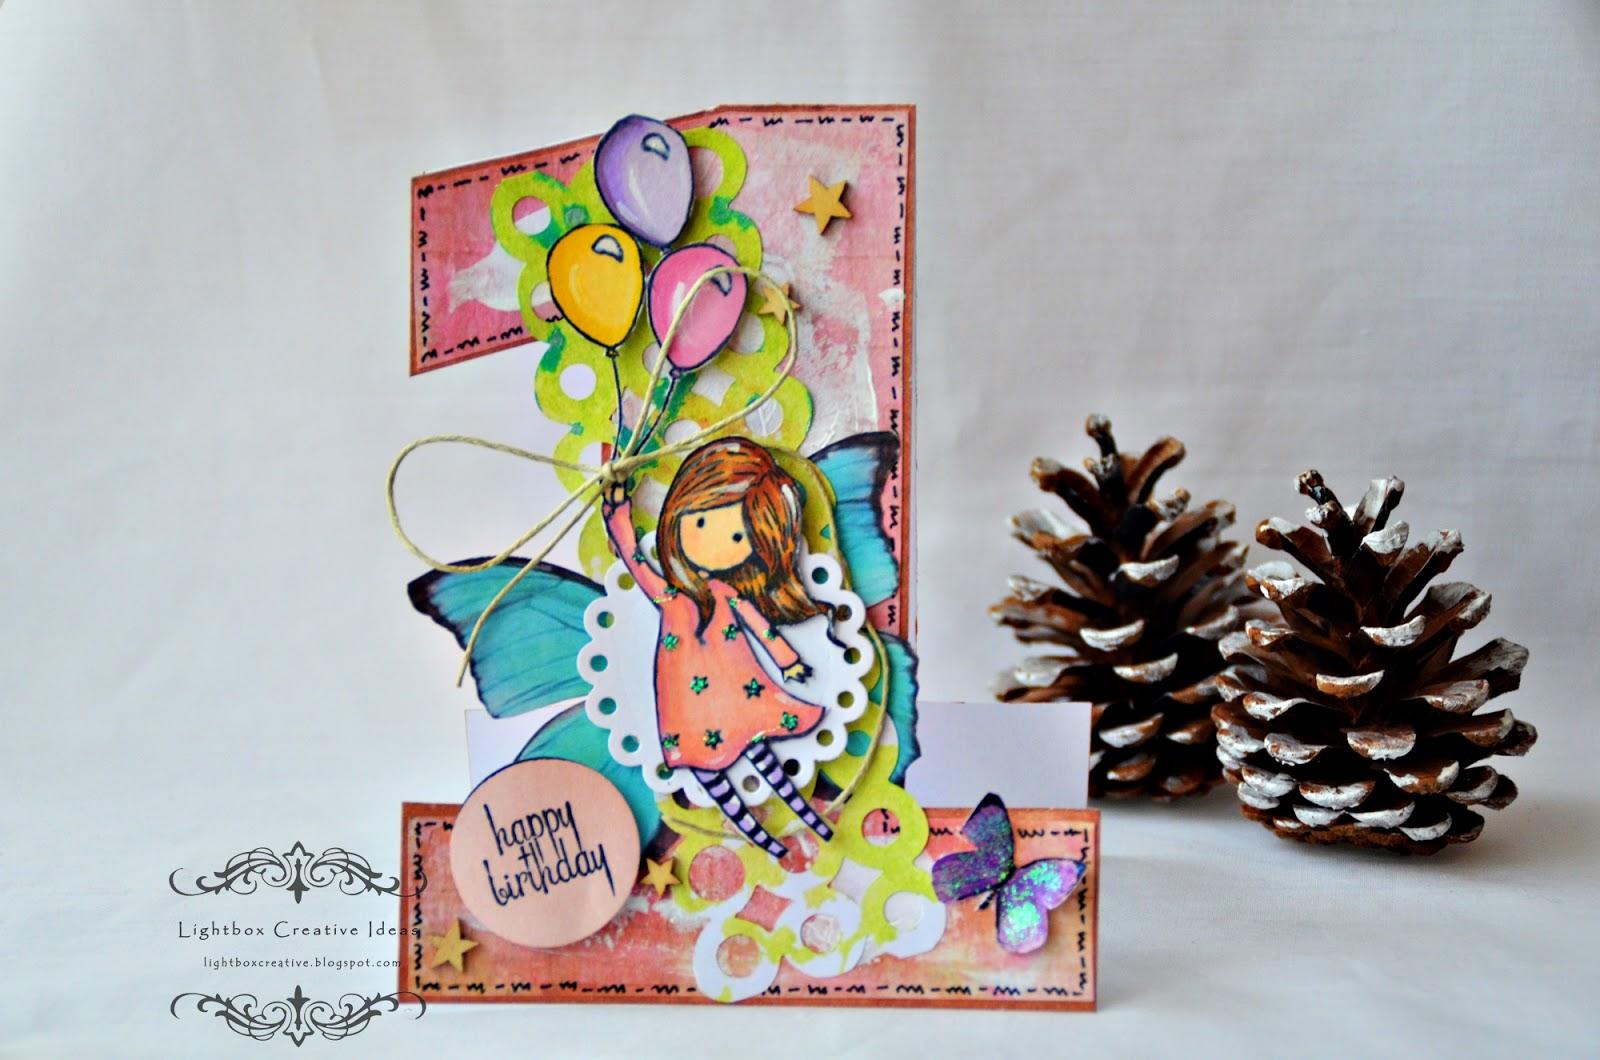 Lightbox creative ideas 1st birthday baby girl card 1st birthday baby girl card bookmarktalkfo Images